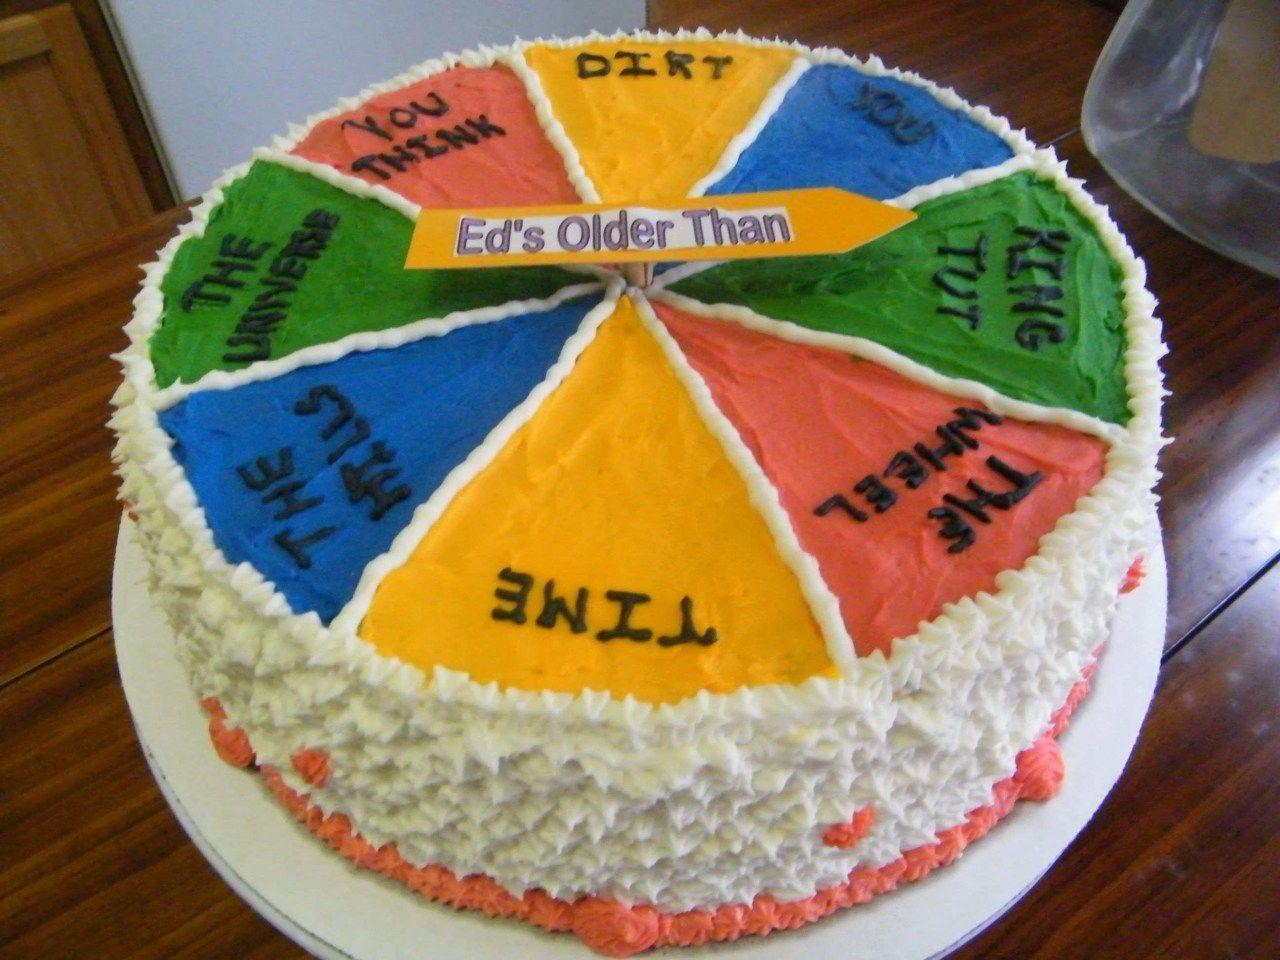 Funny 50Th Birthday Cakes 50th Birthday Cake Decoration Ideas Just Sweets Birthd Funny 50Th Birthday Cakes 50th Birthday Cake Decoration Ideas Just Sweets Birthd Funny 50...